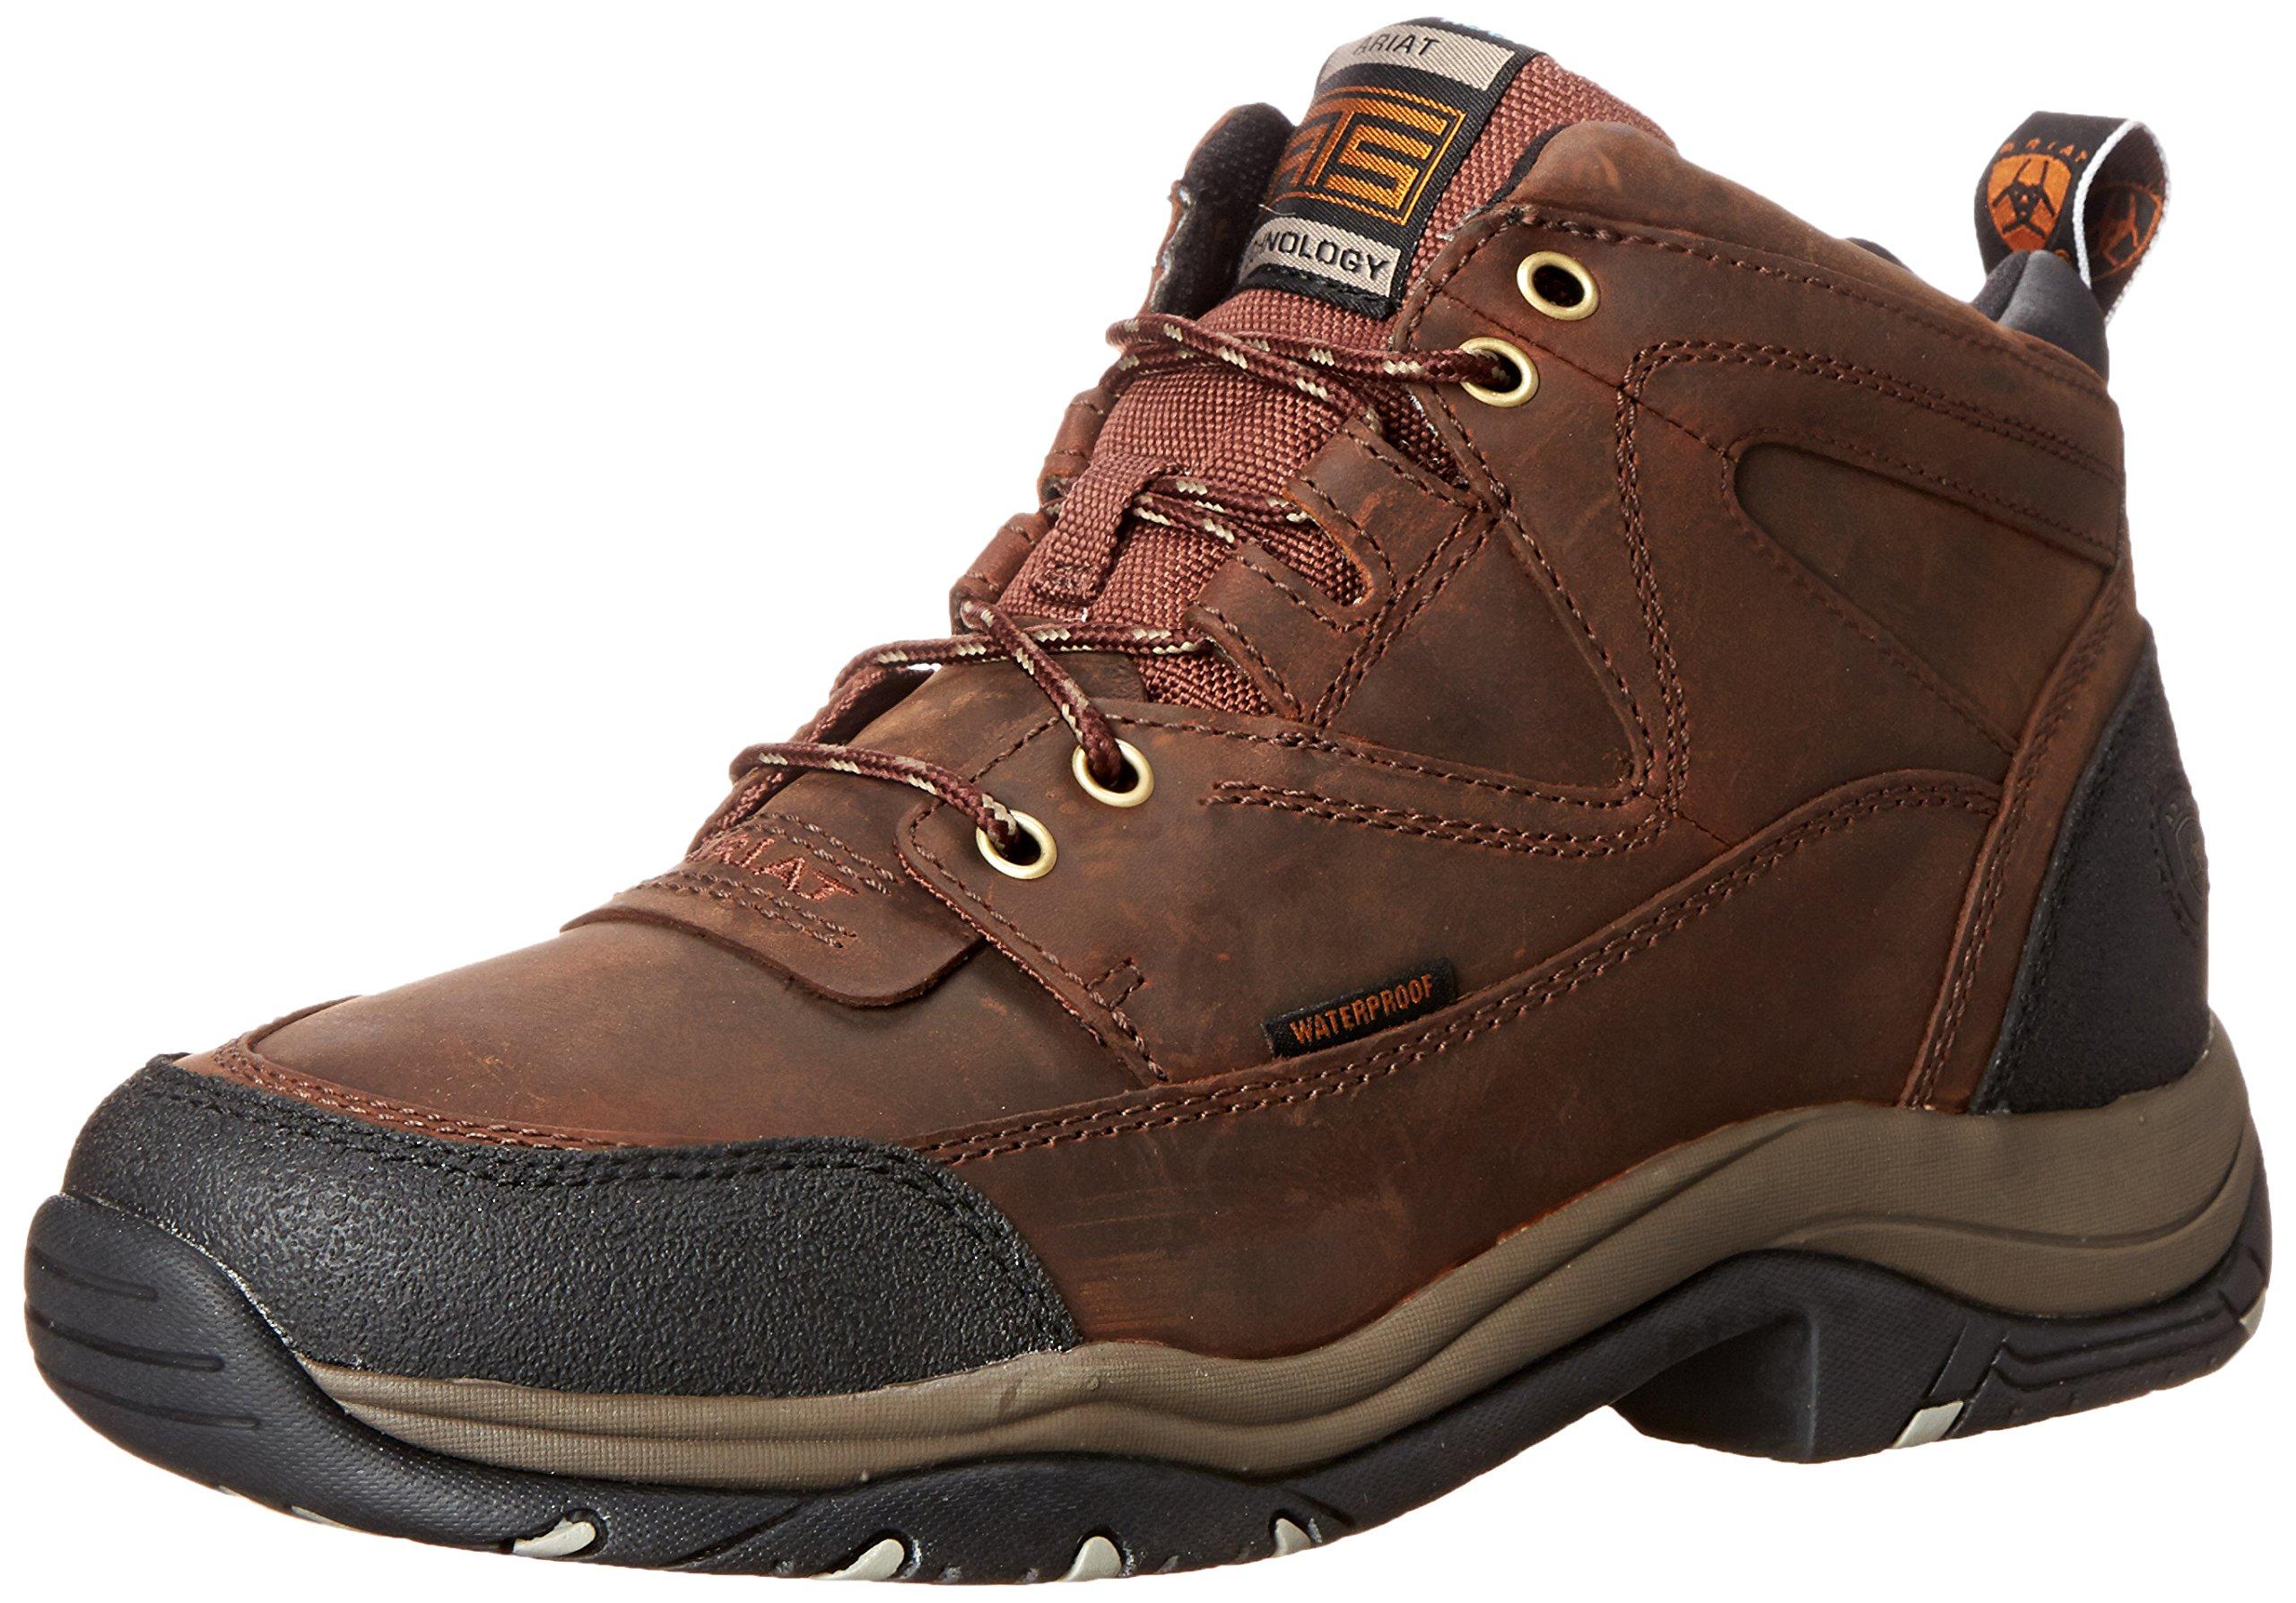 Ariat Men's Terrain H2O Hiking Boot, Copper, 8 EE US